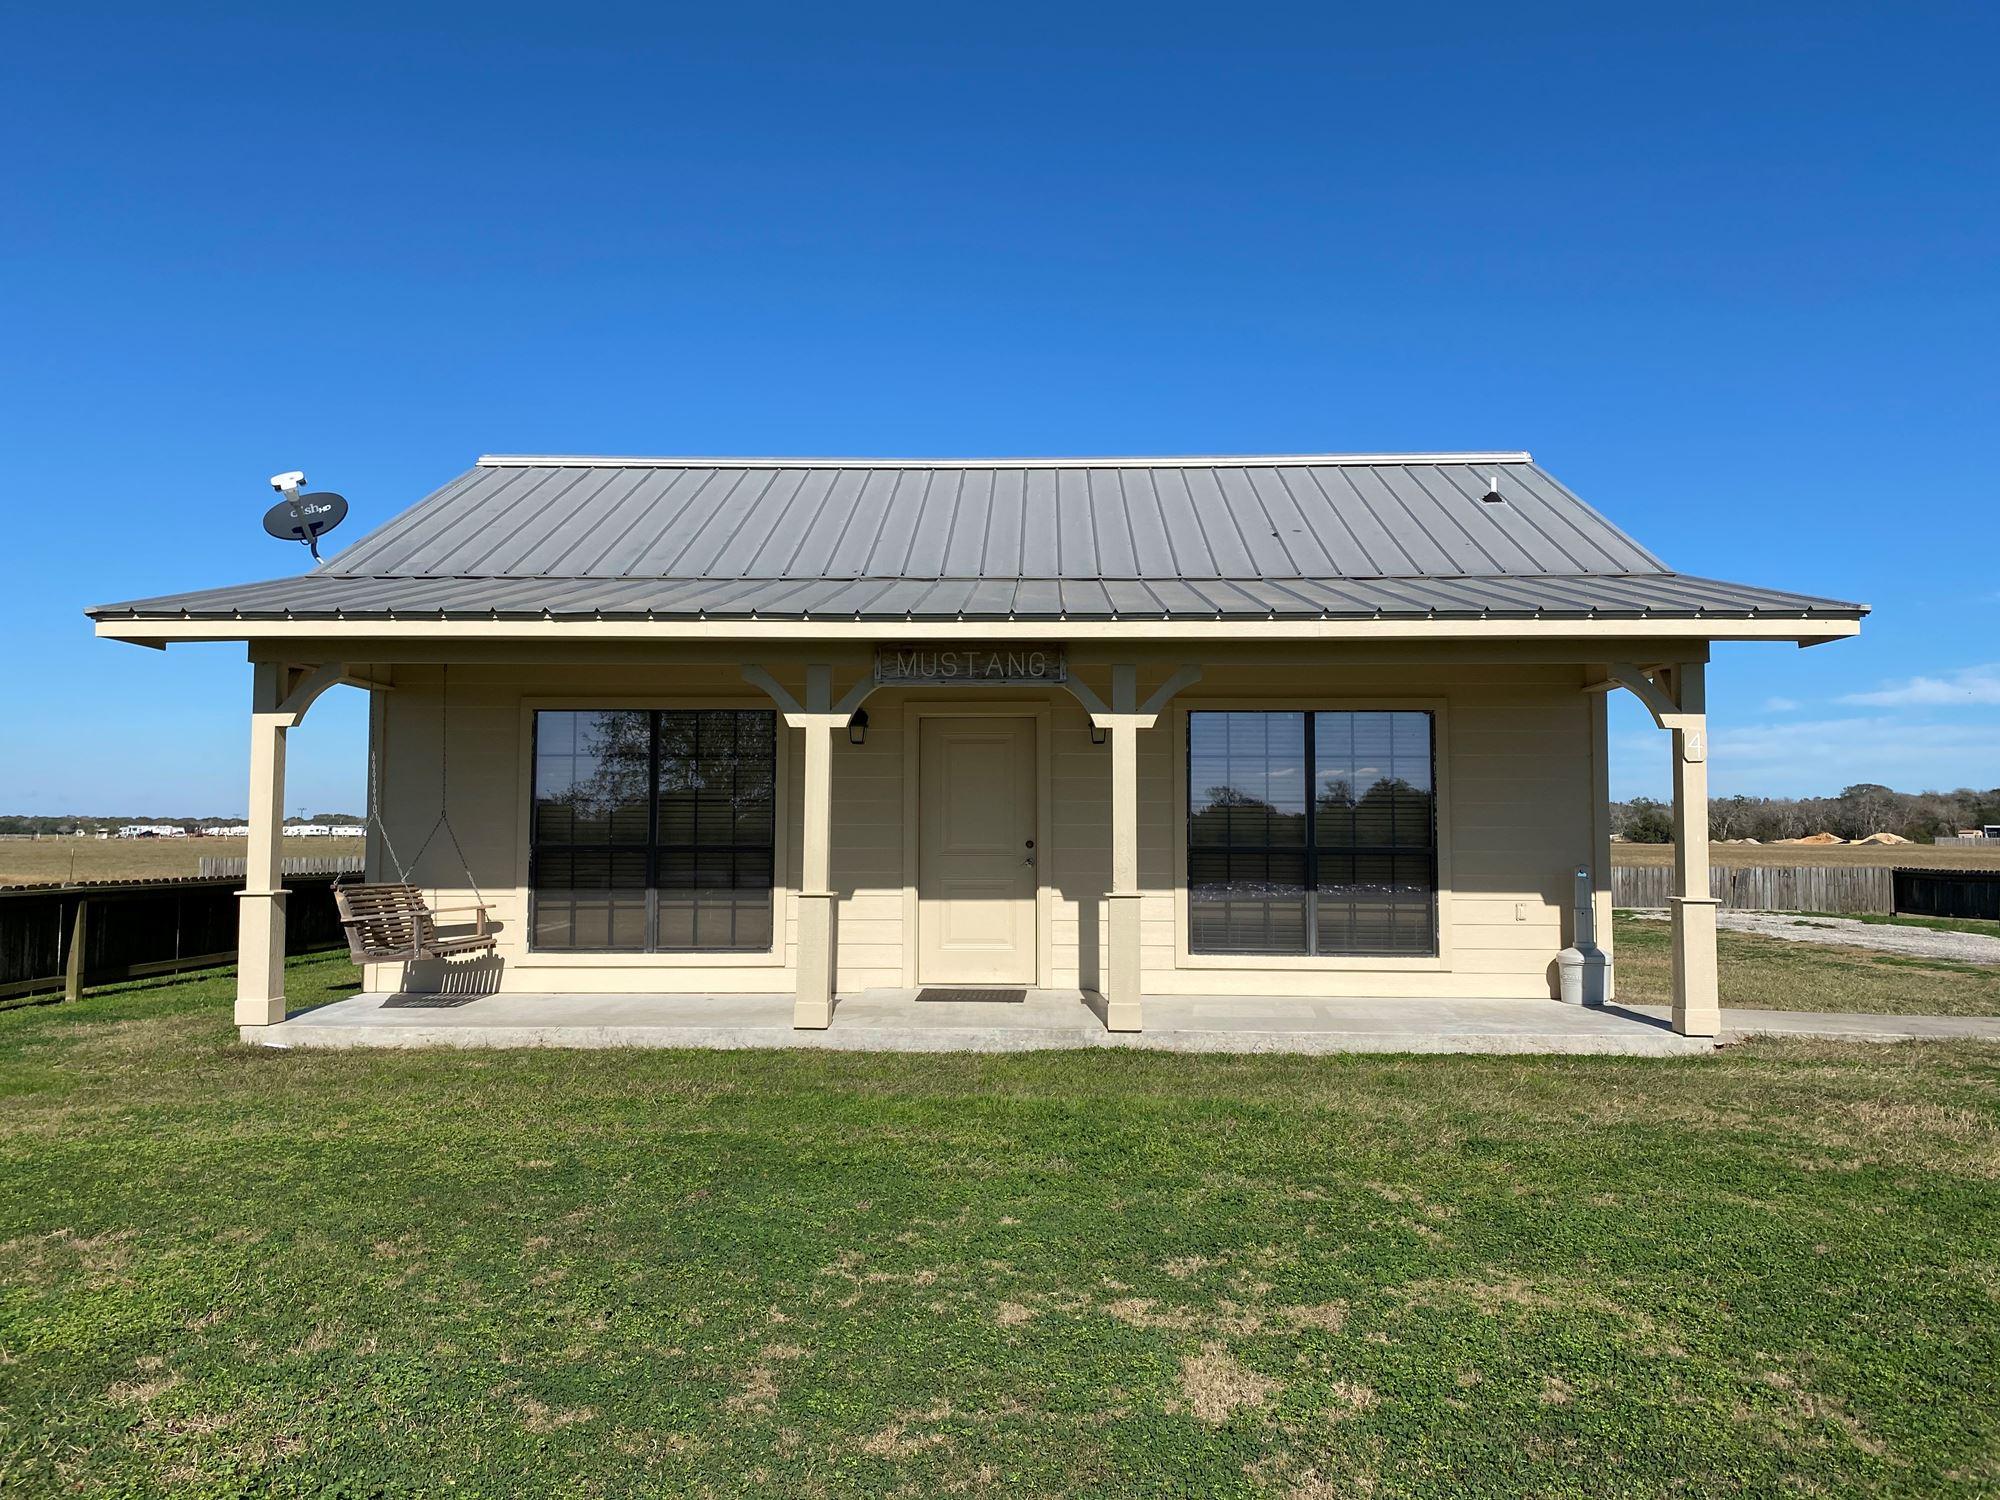 Brackenridge/Texana Cabins